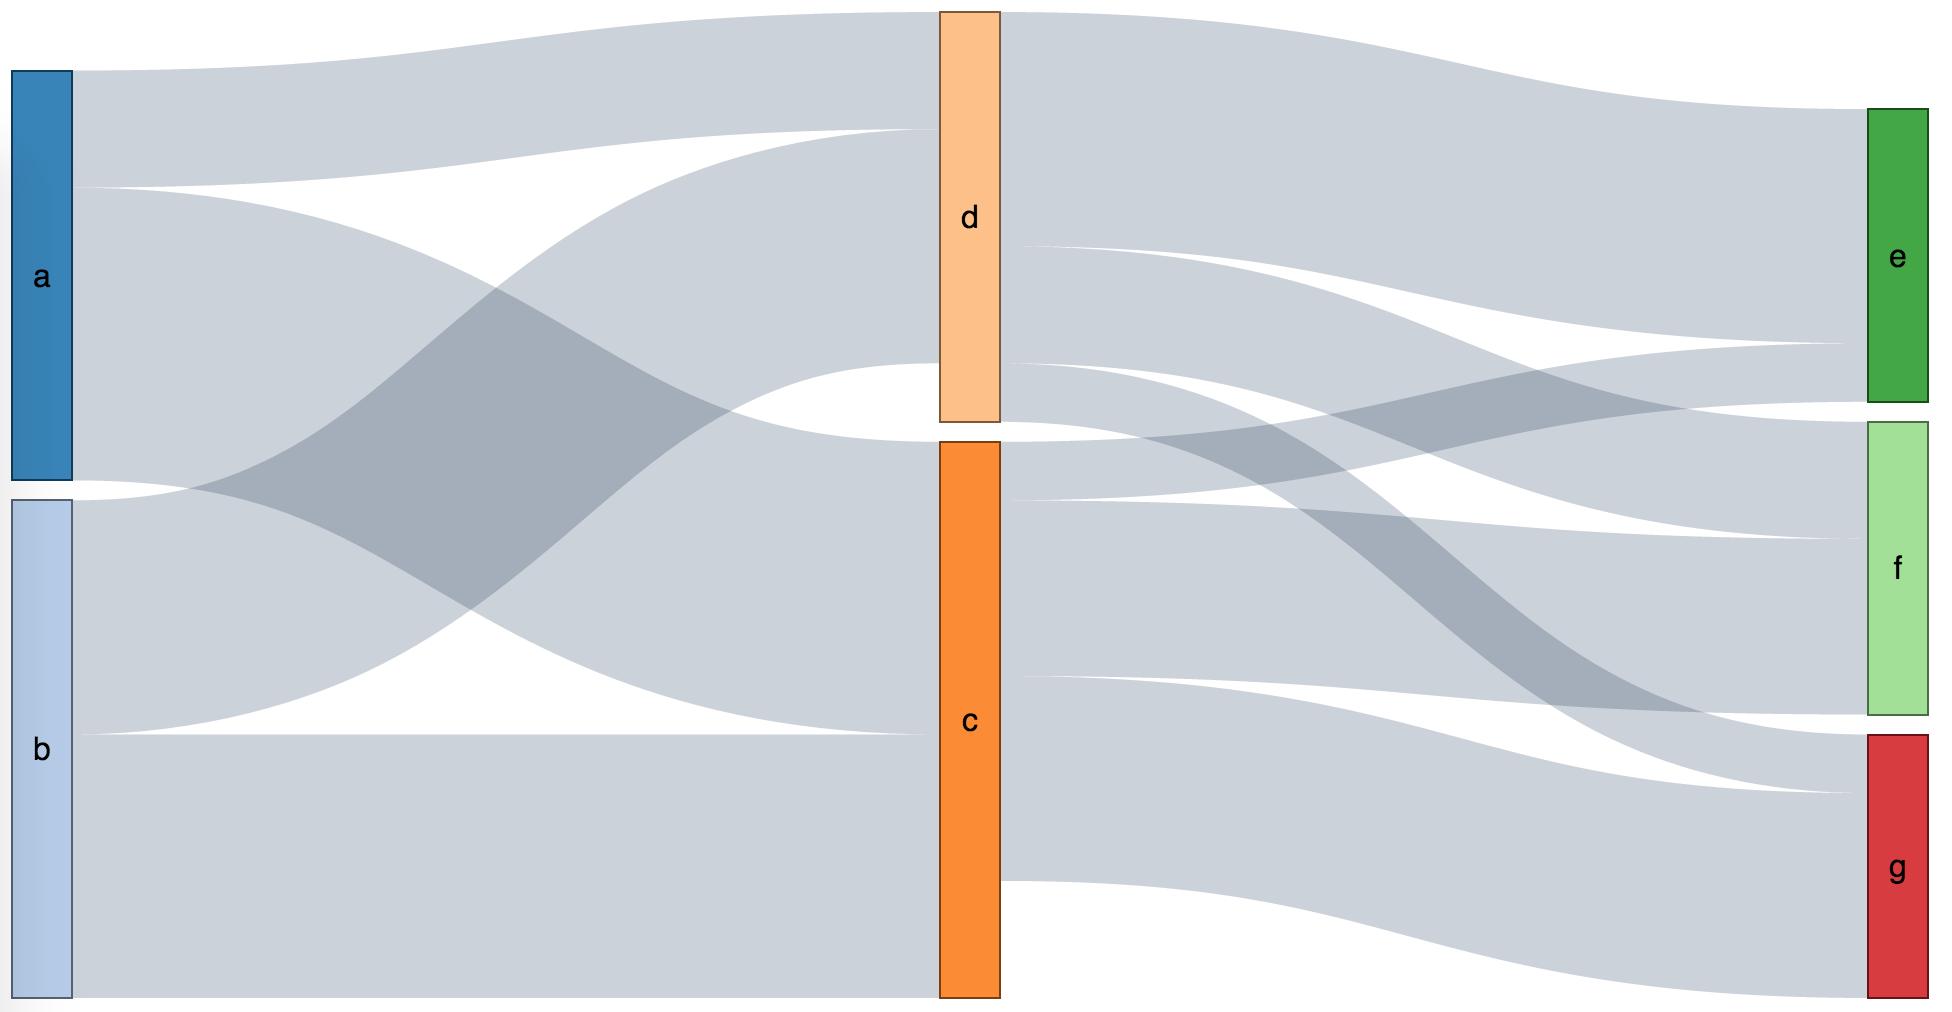 Captain Sankey Diagram Example